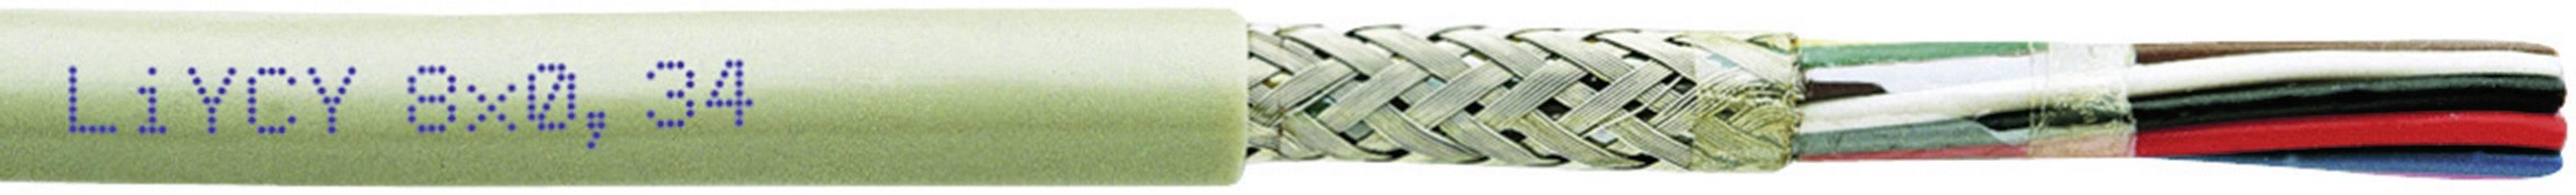 Riadiaci kábel Faber Kabel LiYCY 030472, 12 x 0.75 mm², vonkajší Ø 12 mm, 250 V, metrový tovar, sivá